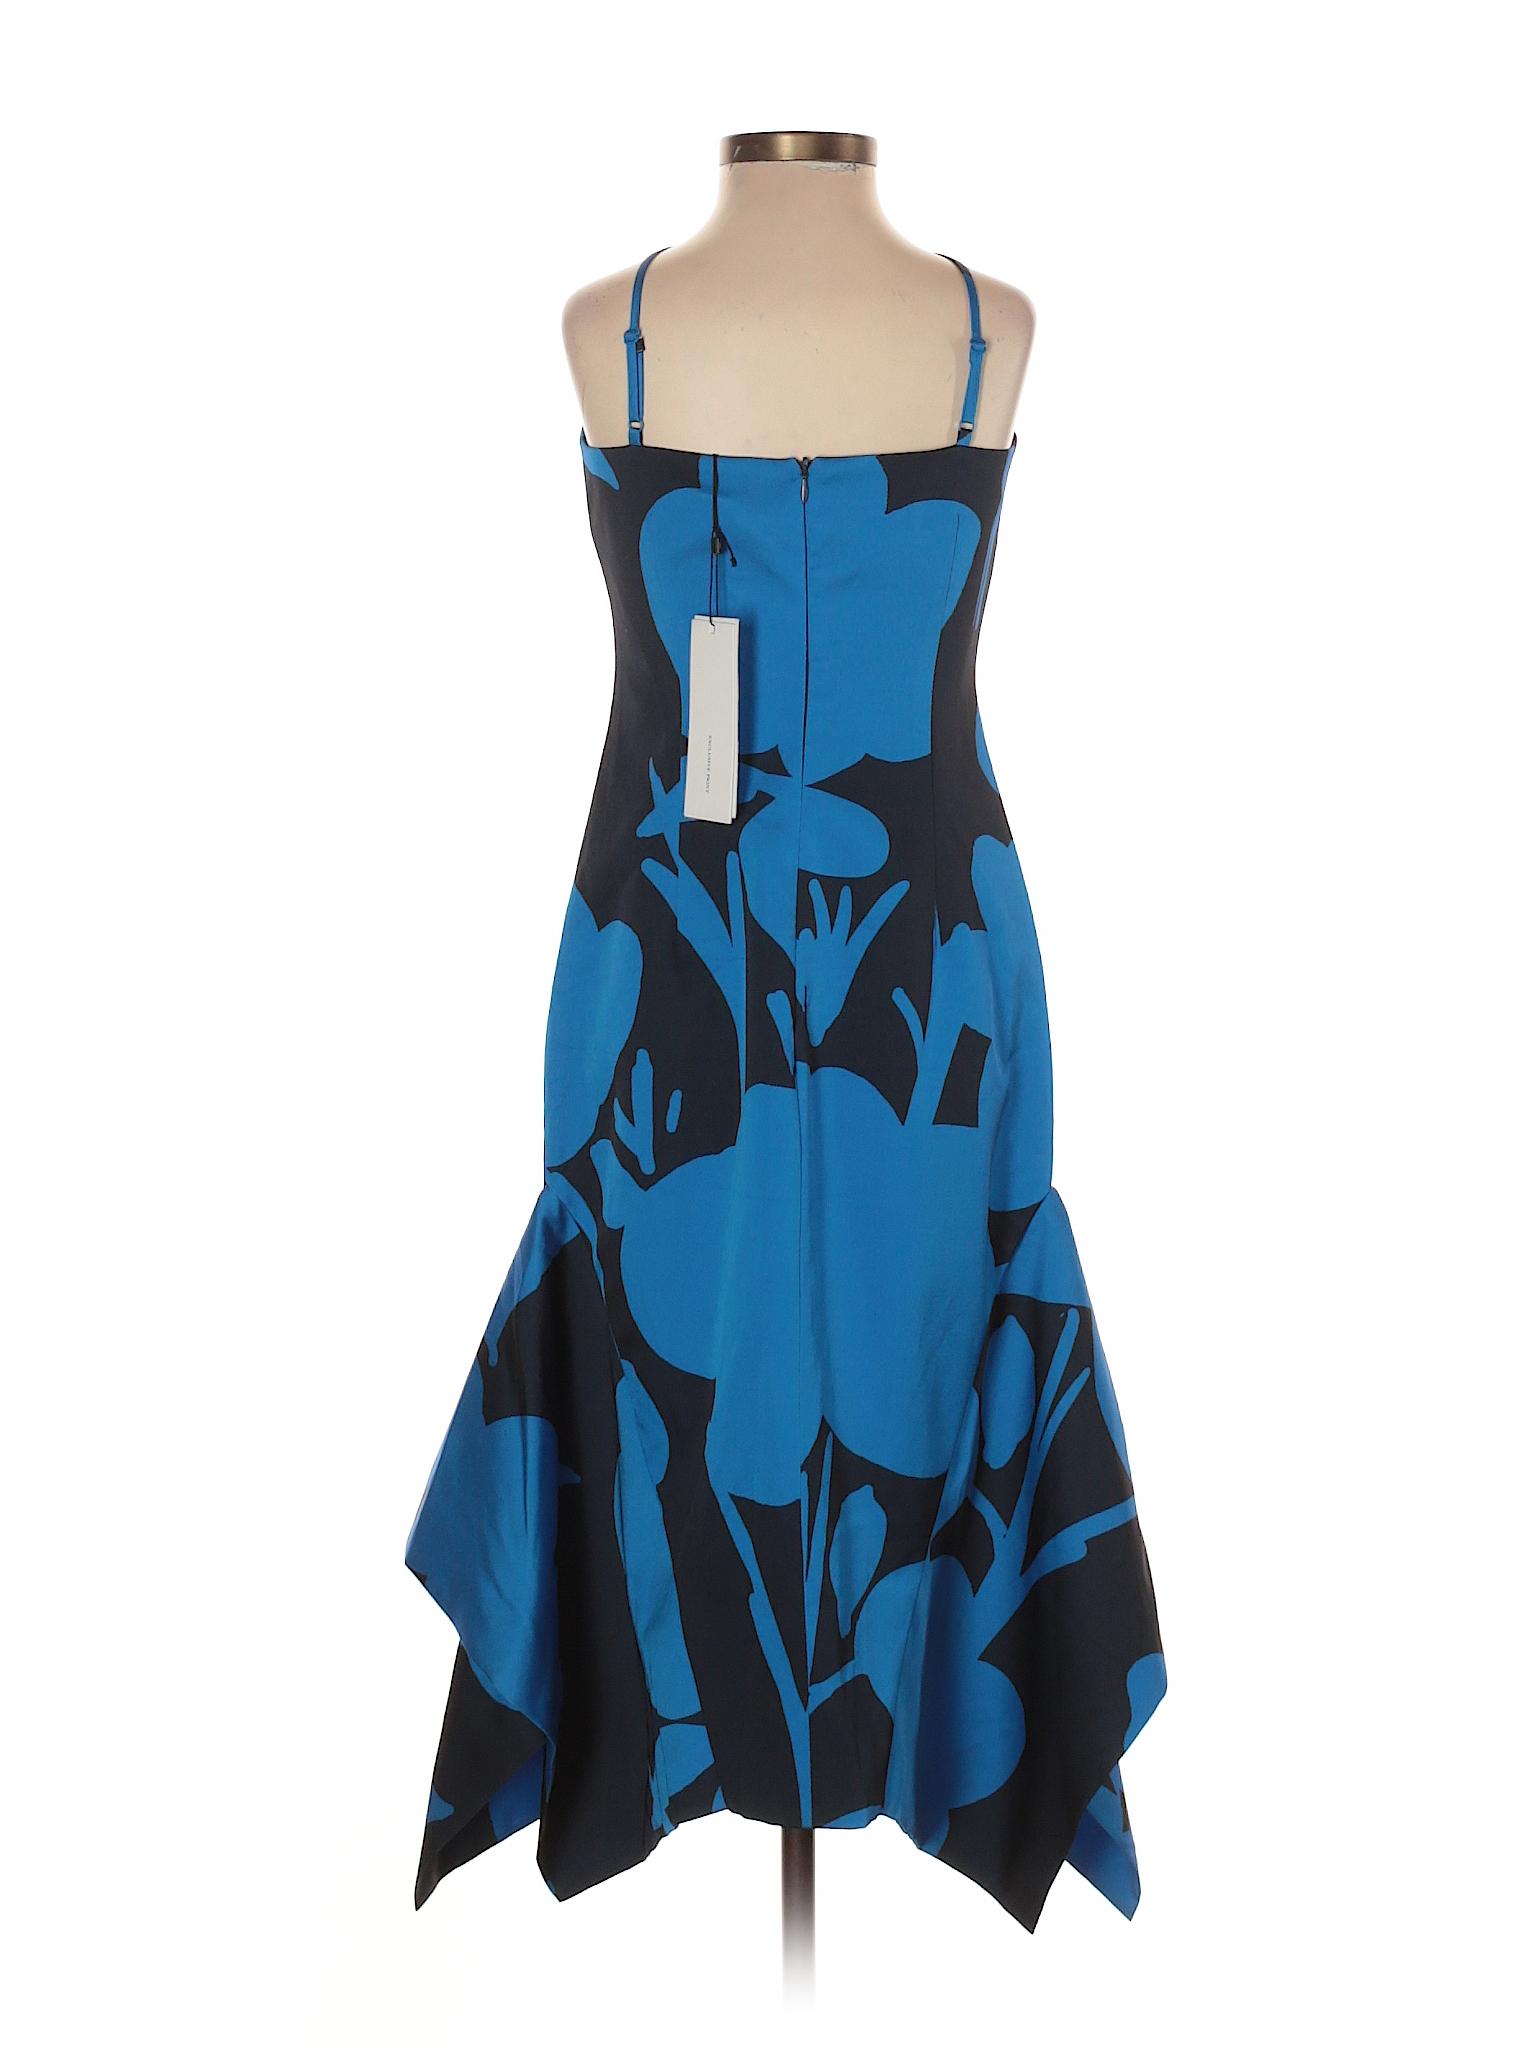 Boutique Boutique Keepsake Casual winter winter Dress 4PwxBqPnd7